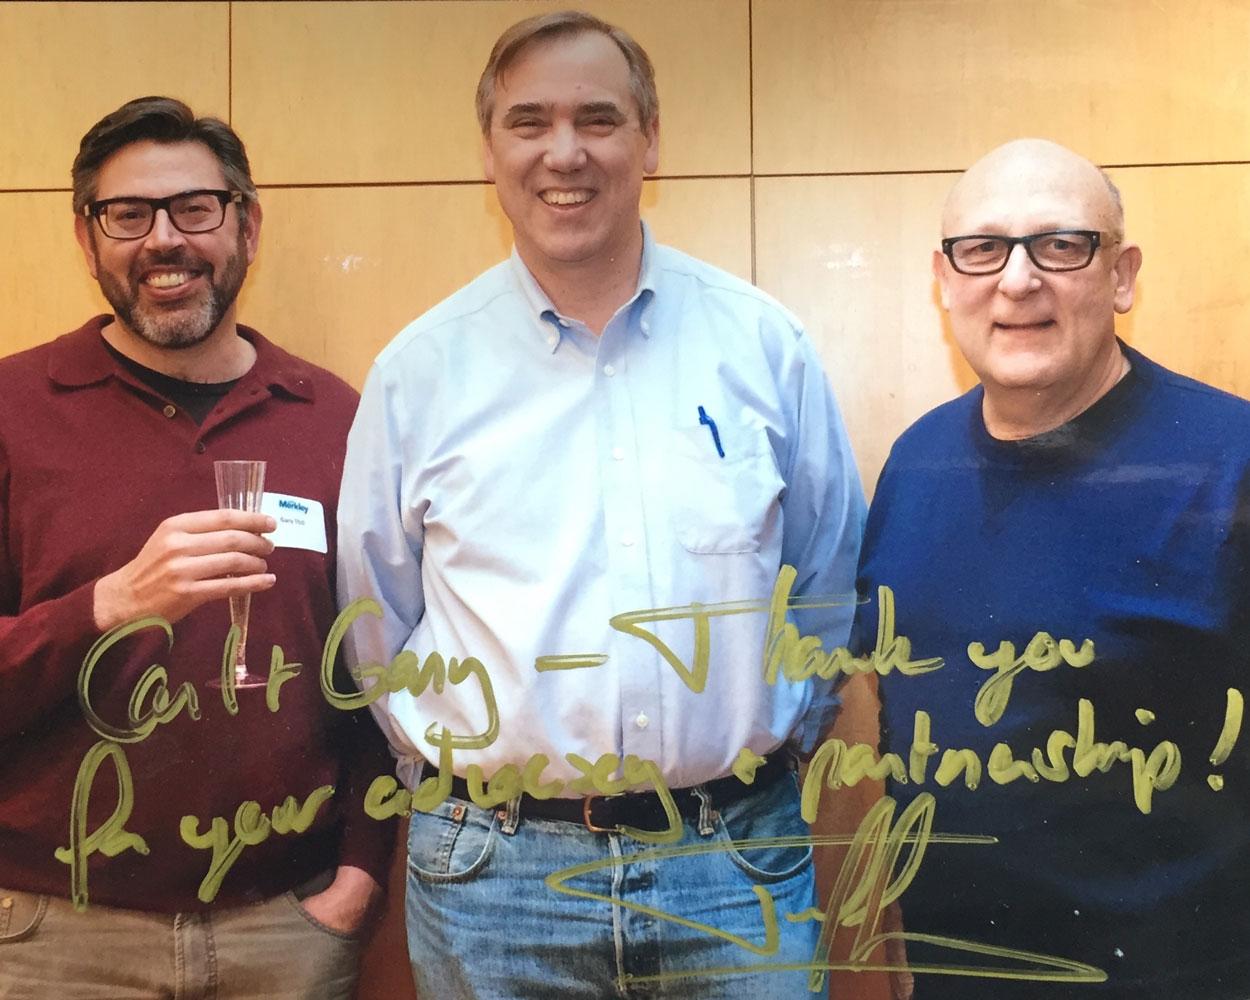 With husband Gary Thill and Senator Jeff Merkley